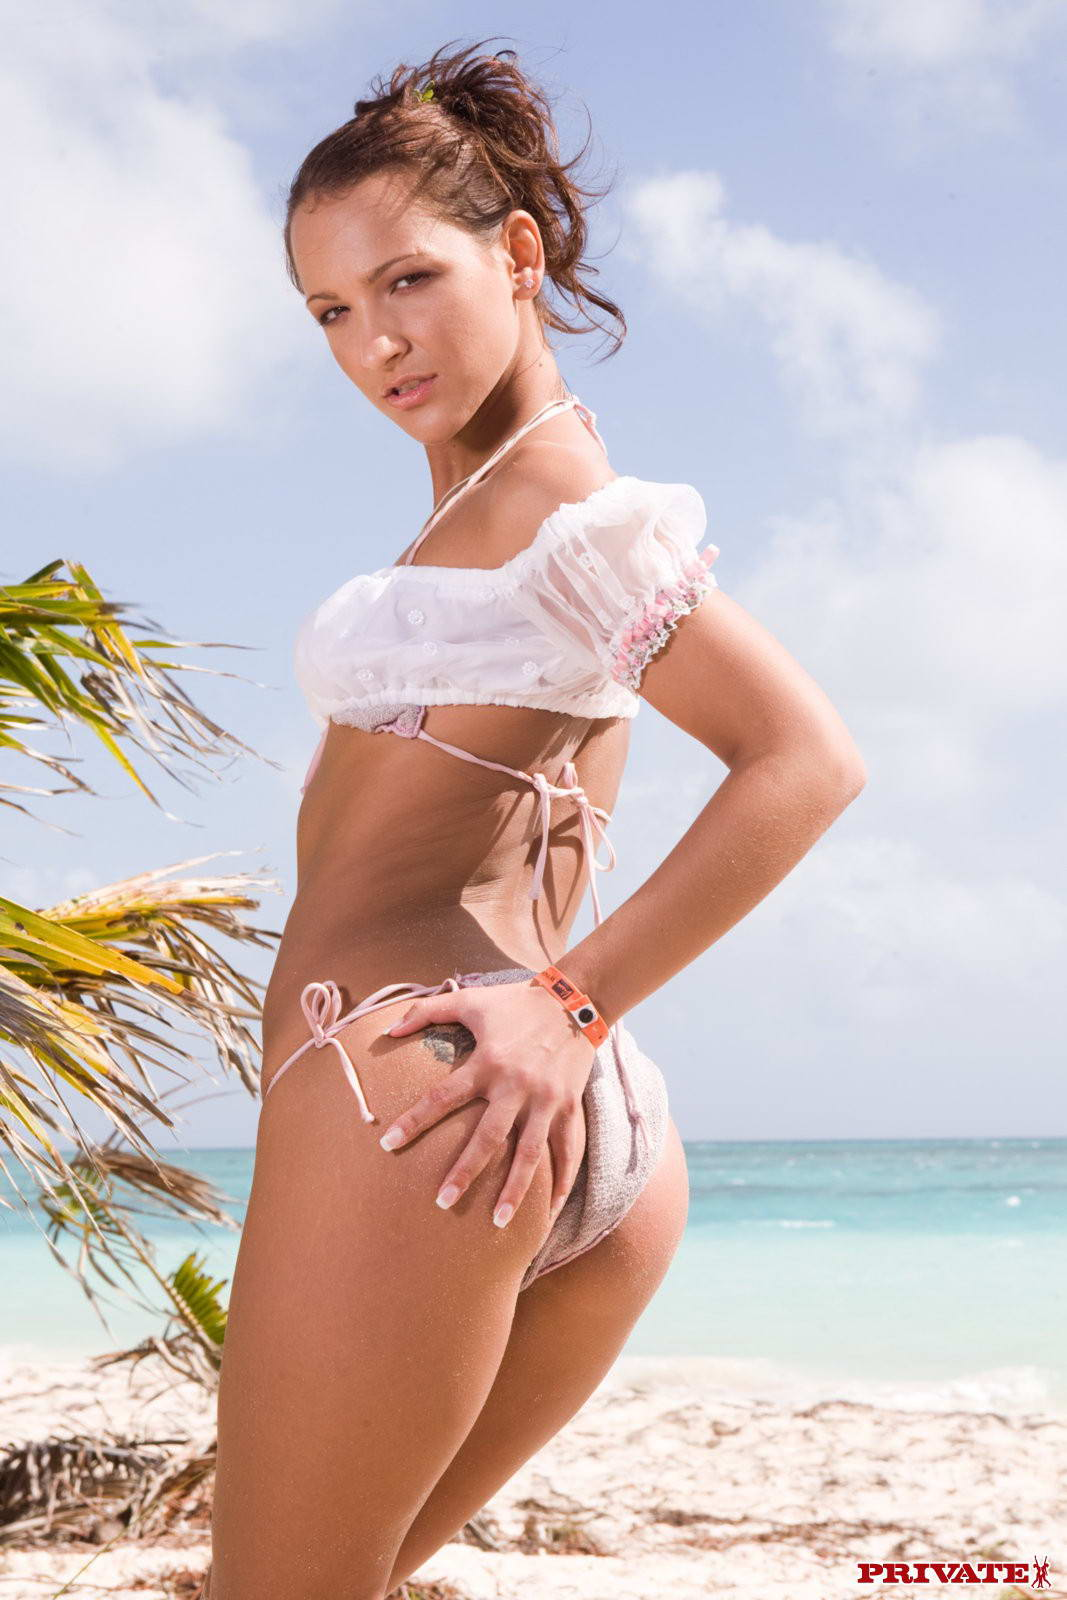 beach-bikini-vagina-sex